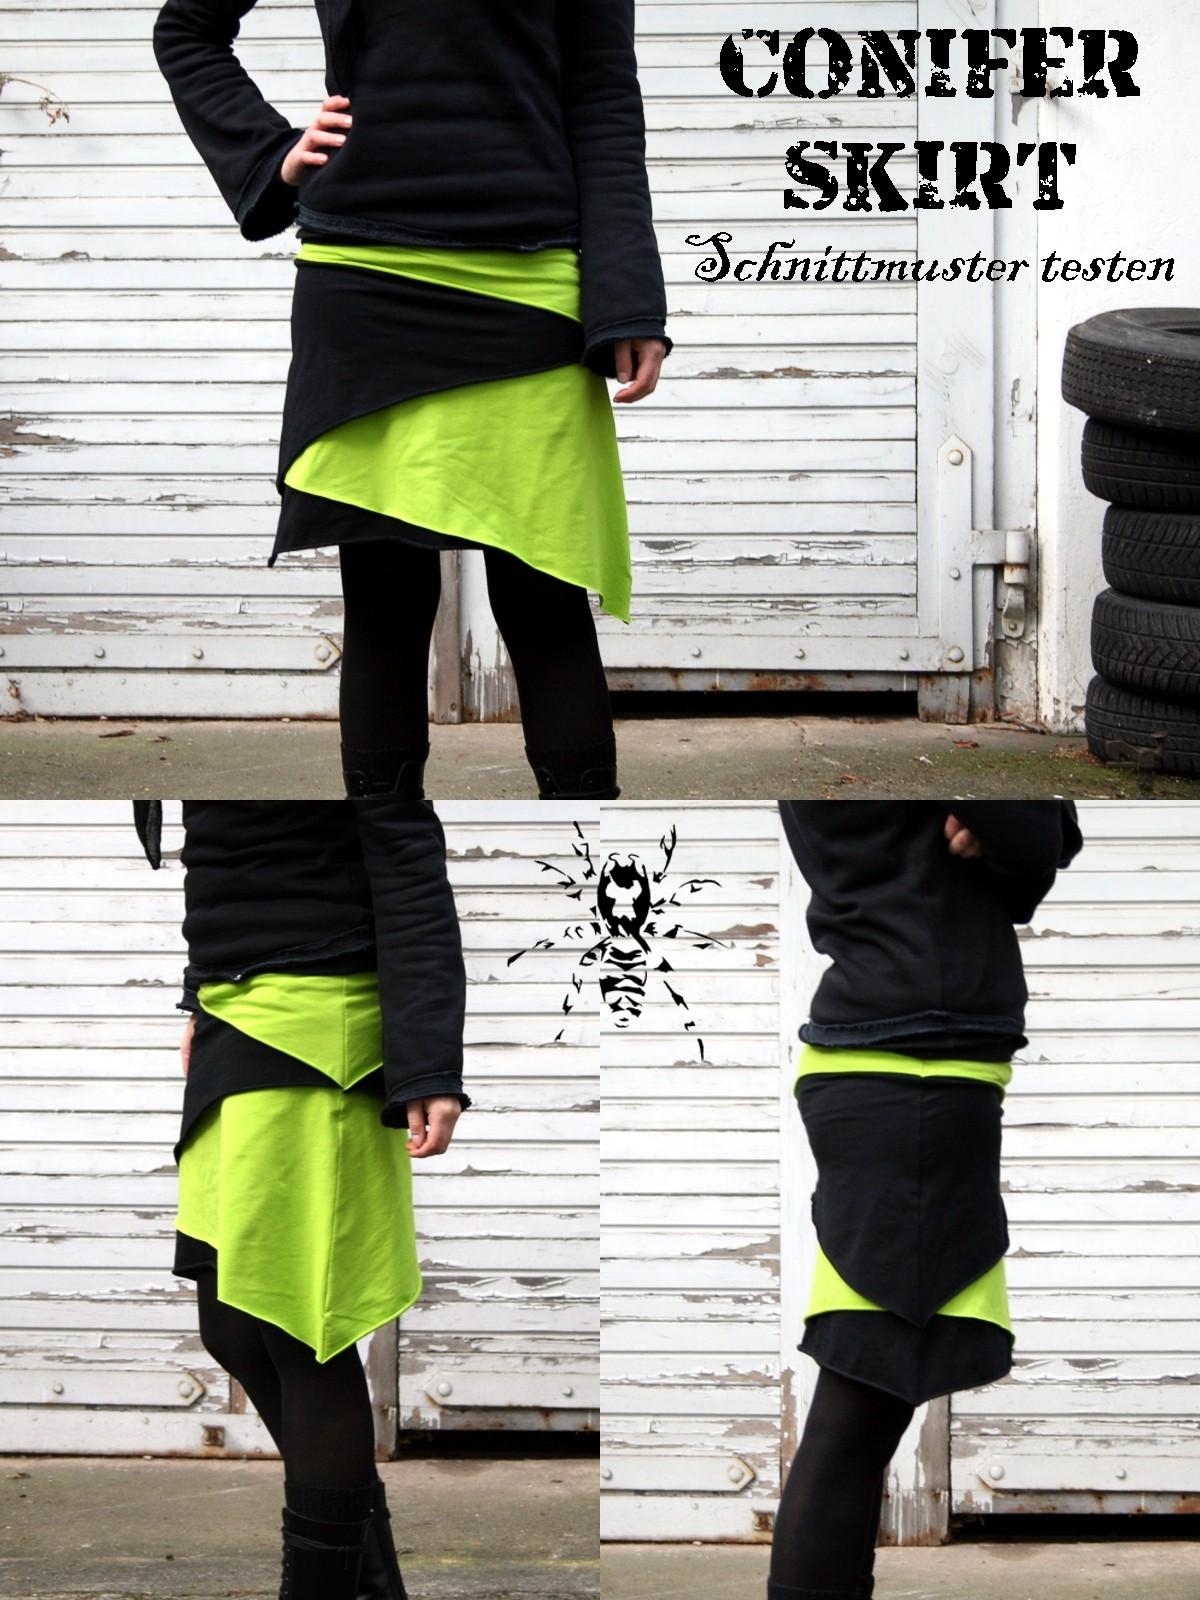 Conifer Skirt - Schnittmuster testen - Zebraspider DIY Anti-Fashion ...